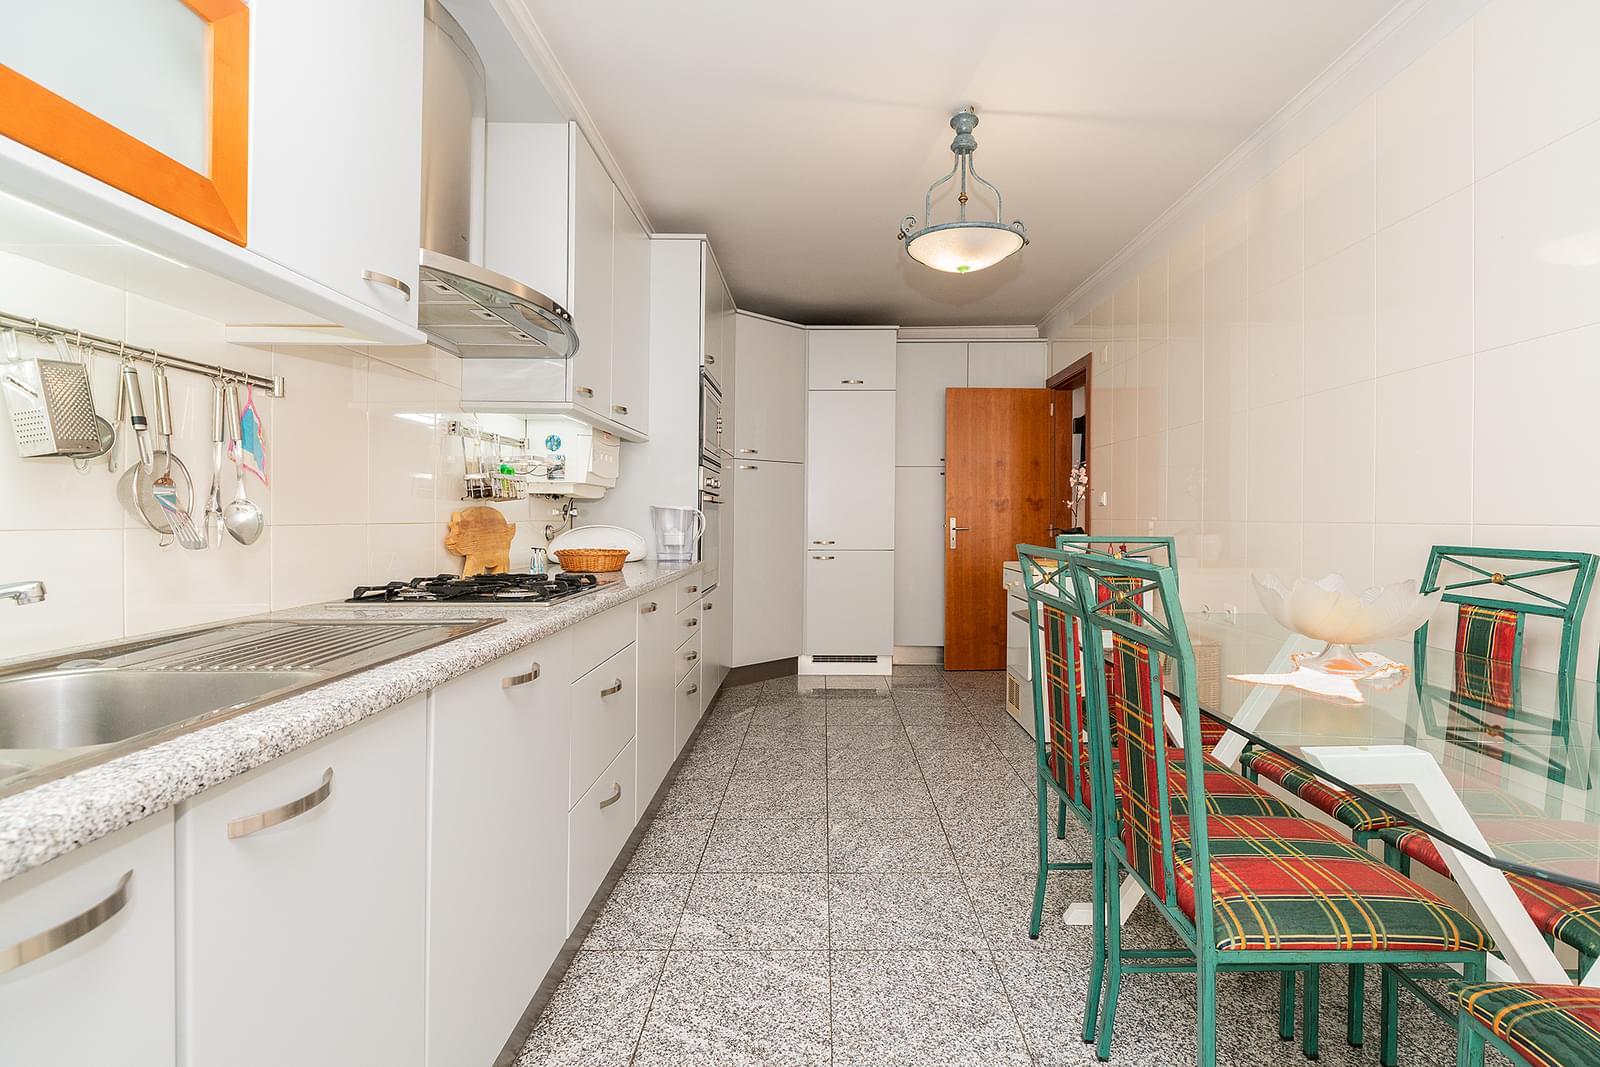 pf18049-apartamento-t3-lisboa-25c34640-e3fe-4b09-9e2d-eac419fdc2a6